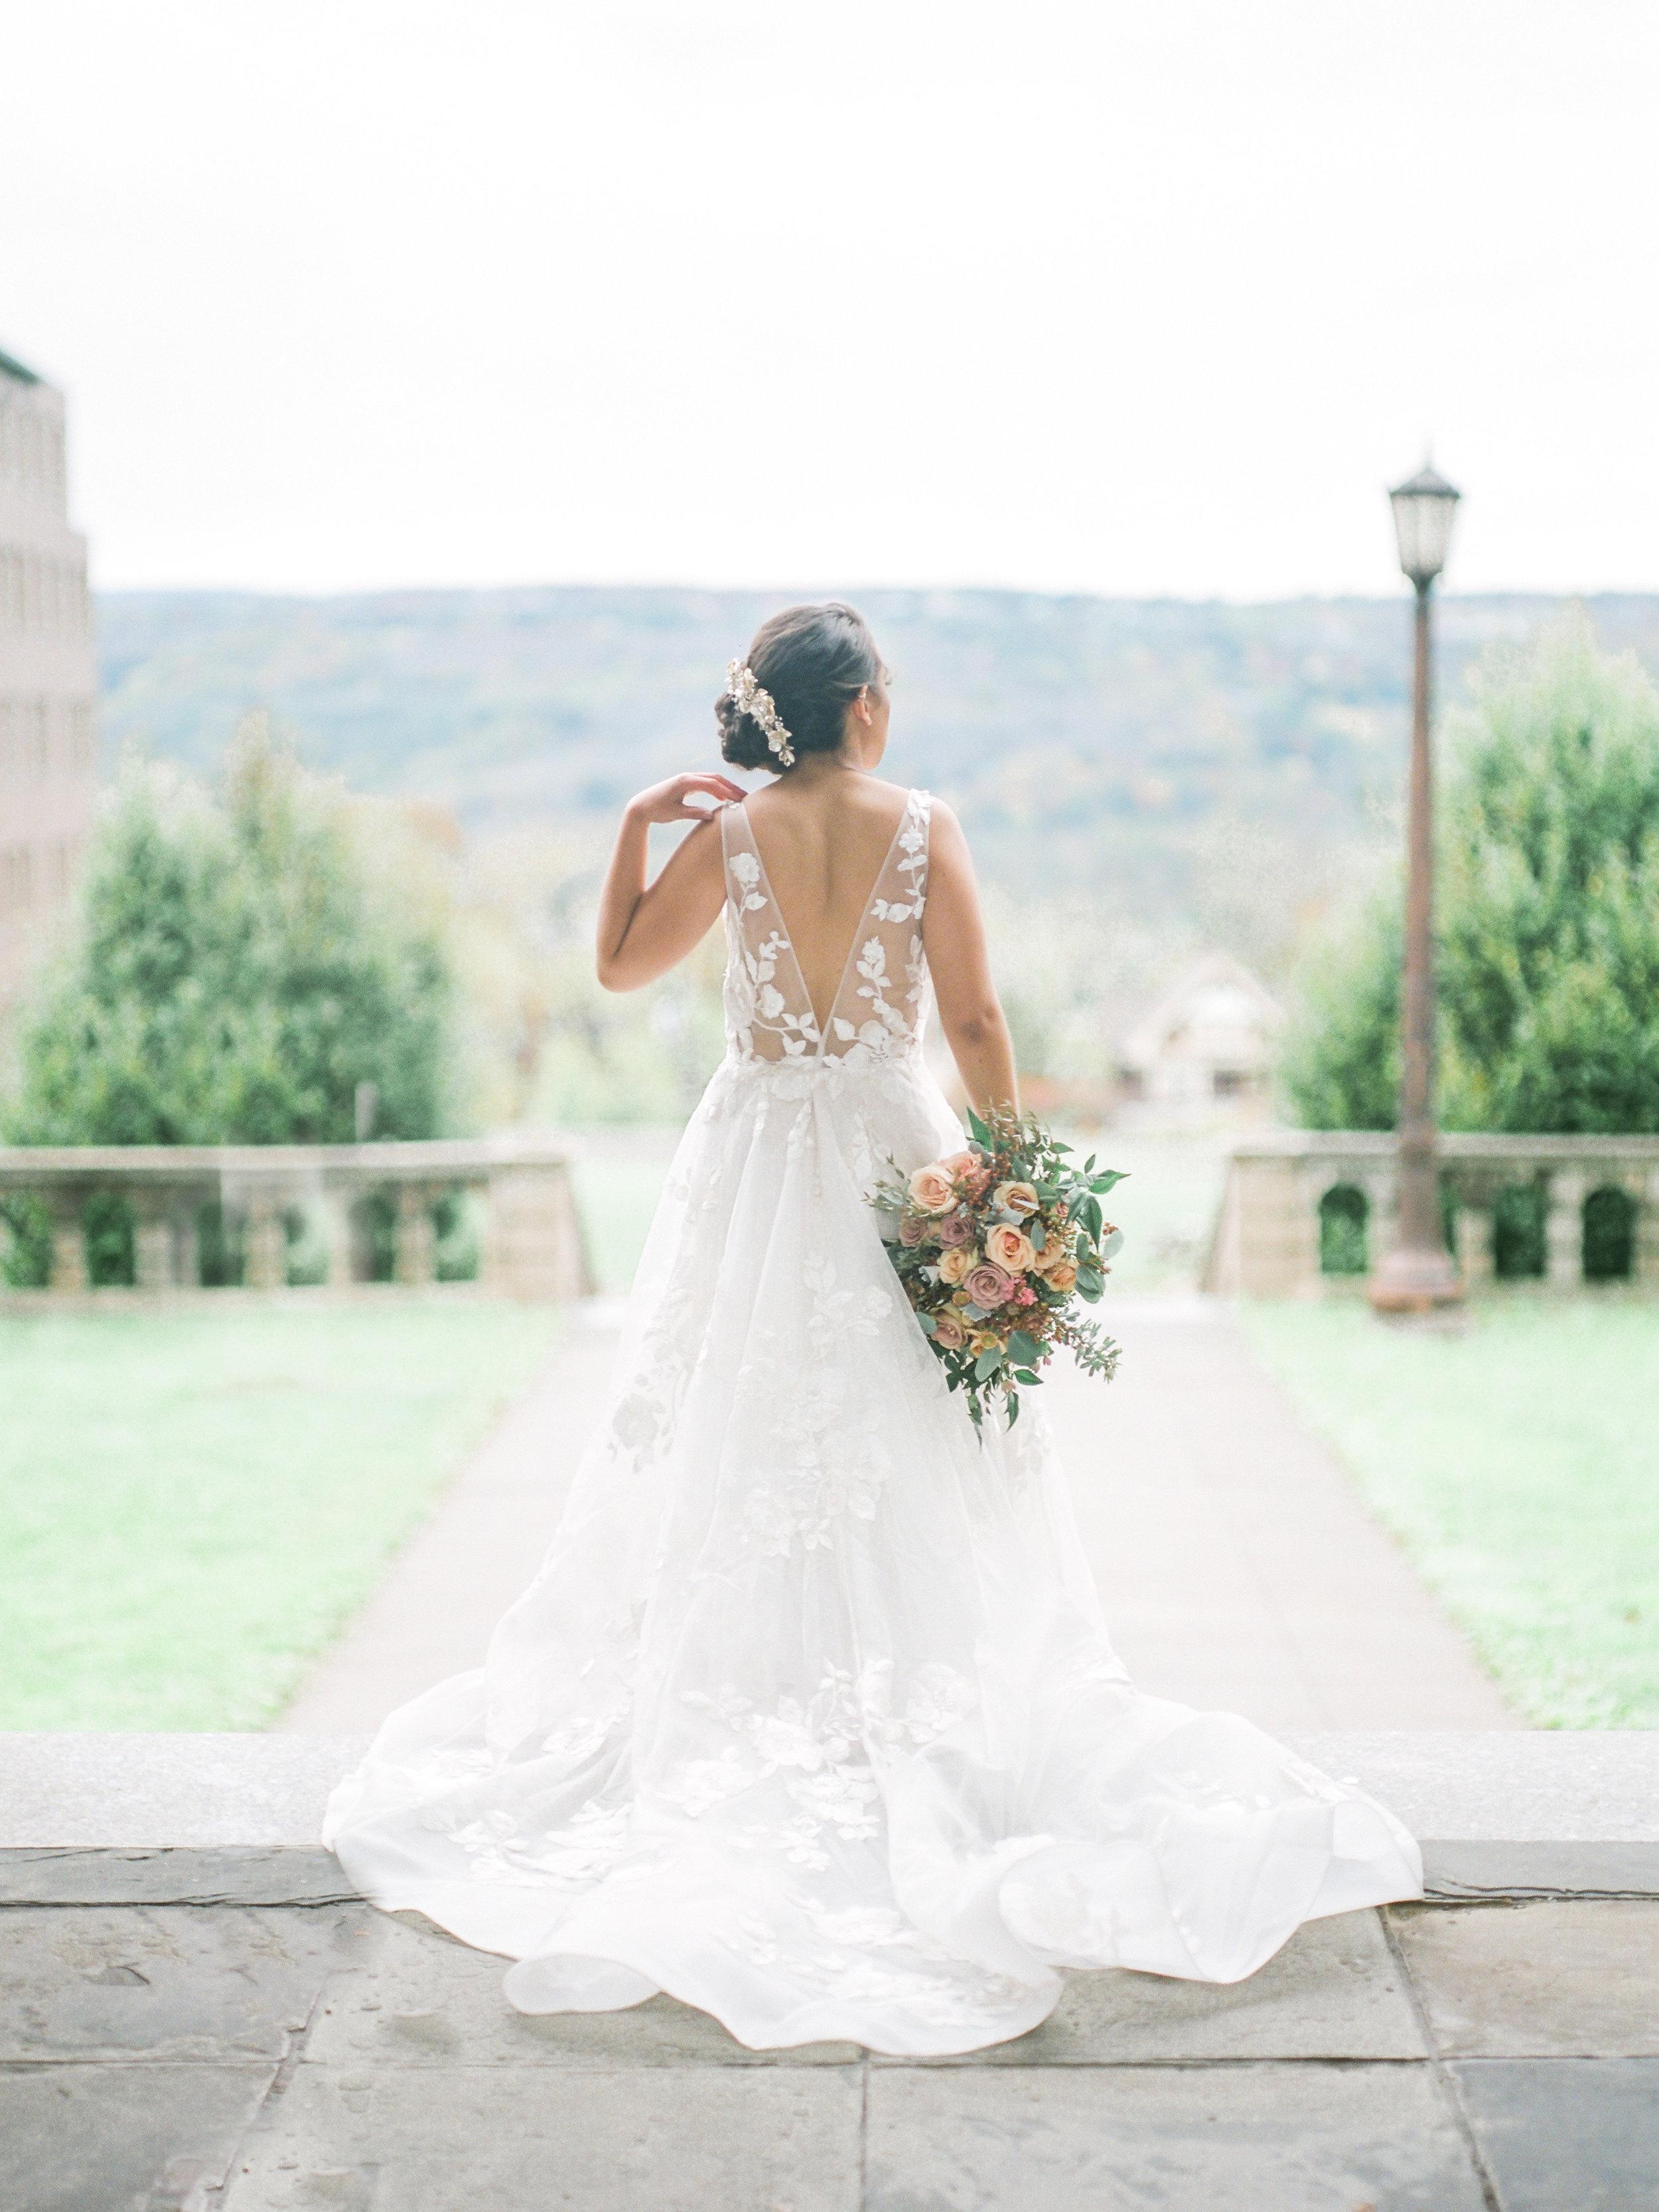 Ithaca New York-Brides Story-Manda Weaver-Wedding-18.jpg